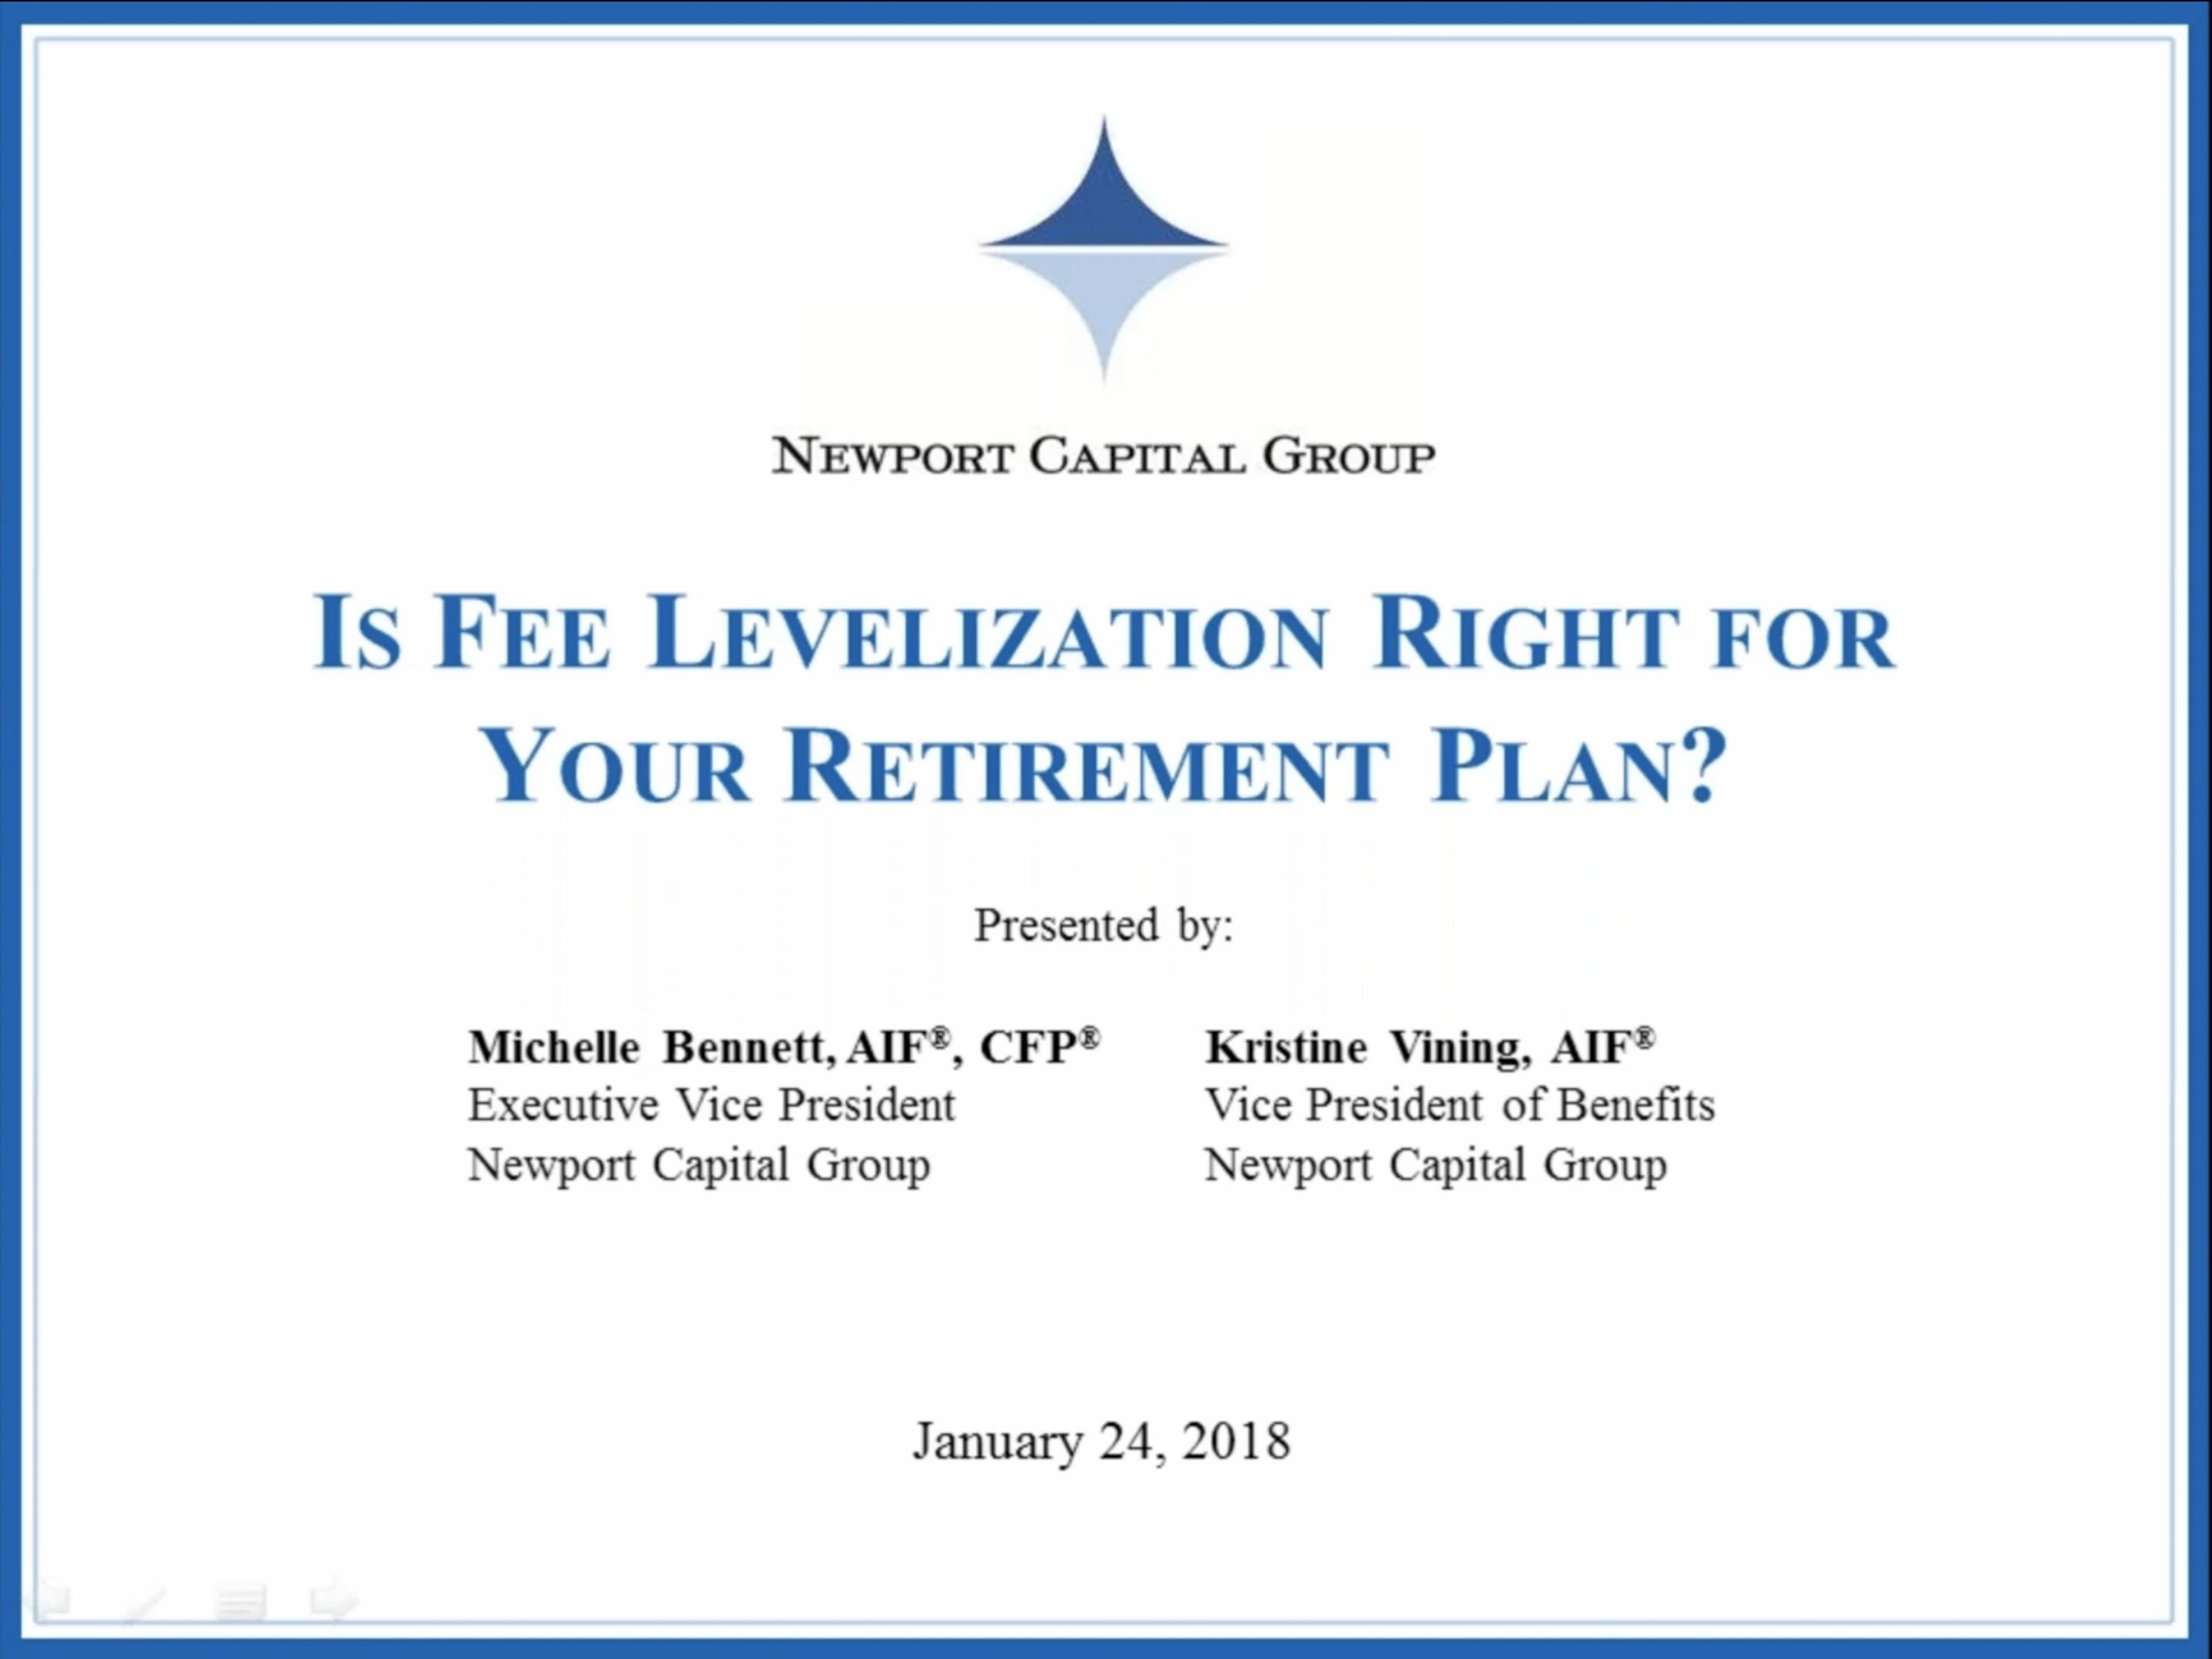 Fee Levelization